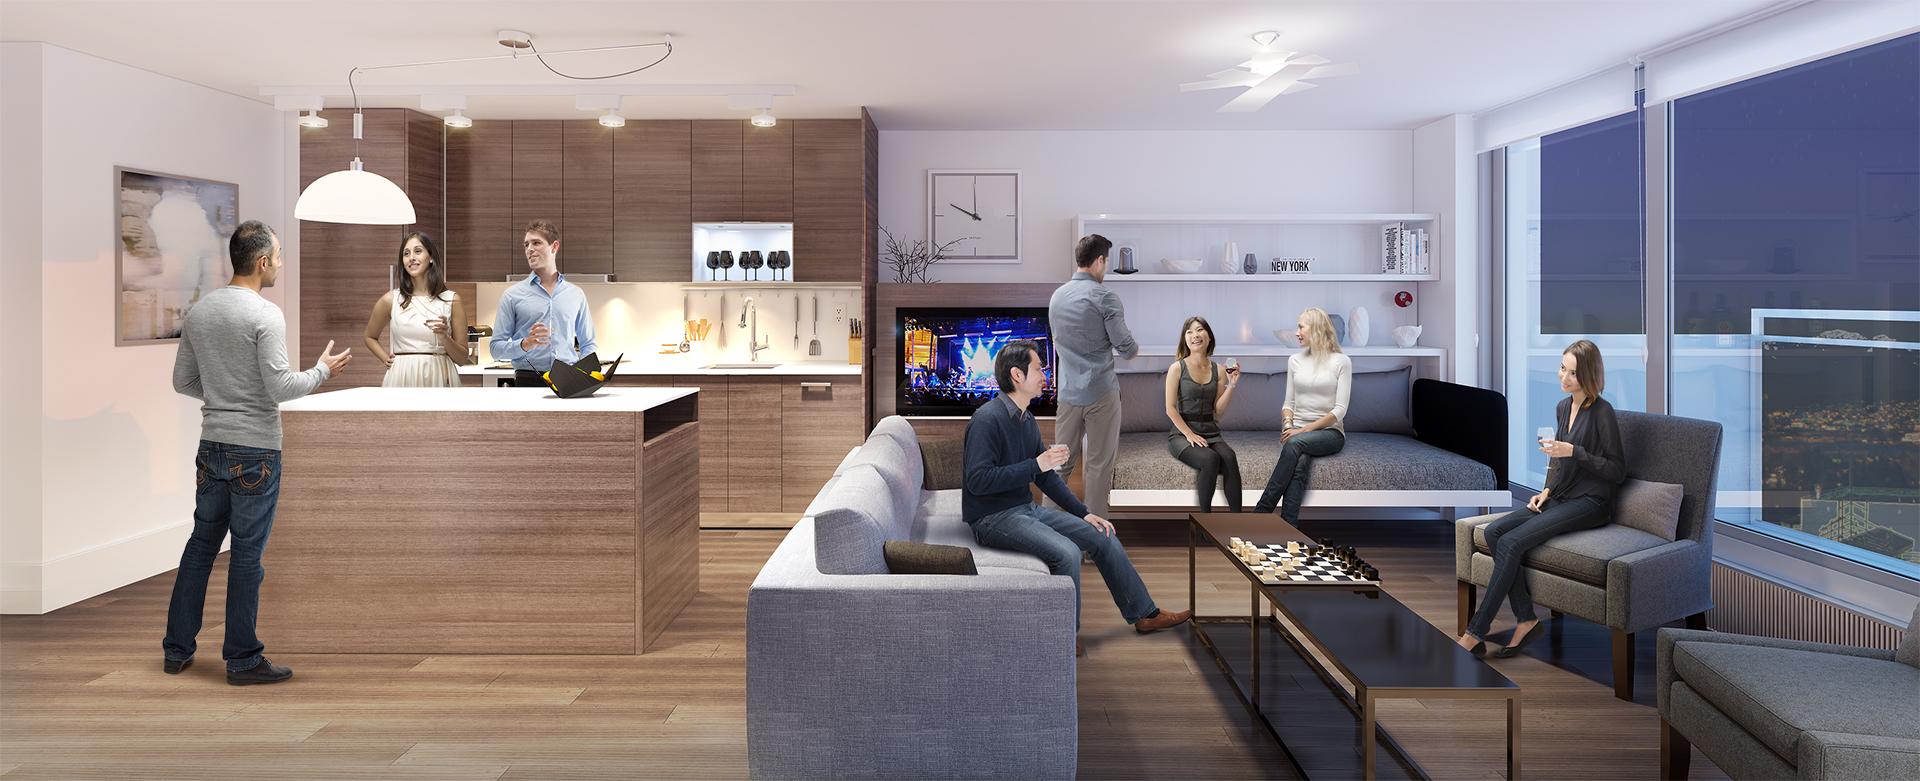 Pullout Sofa Interior Design Ideas